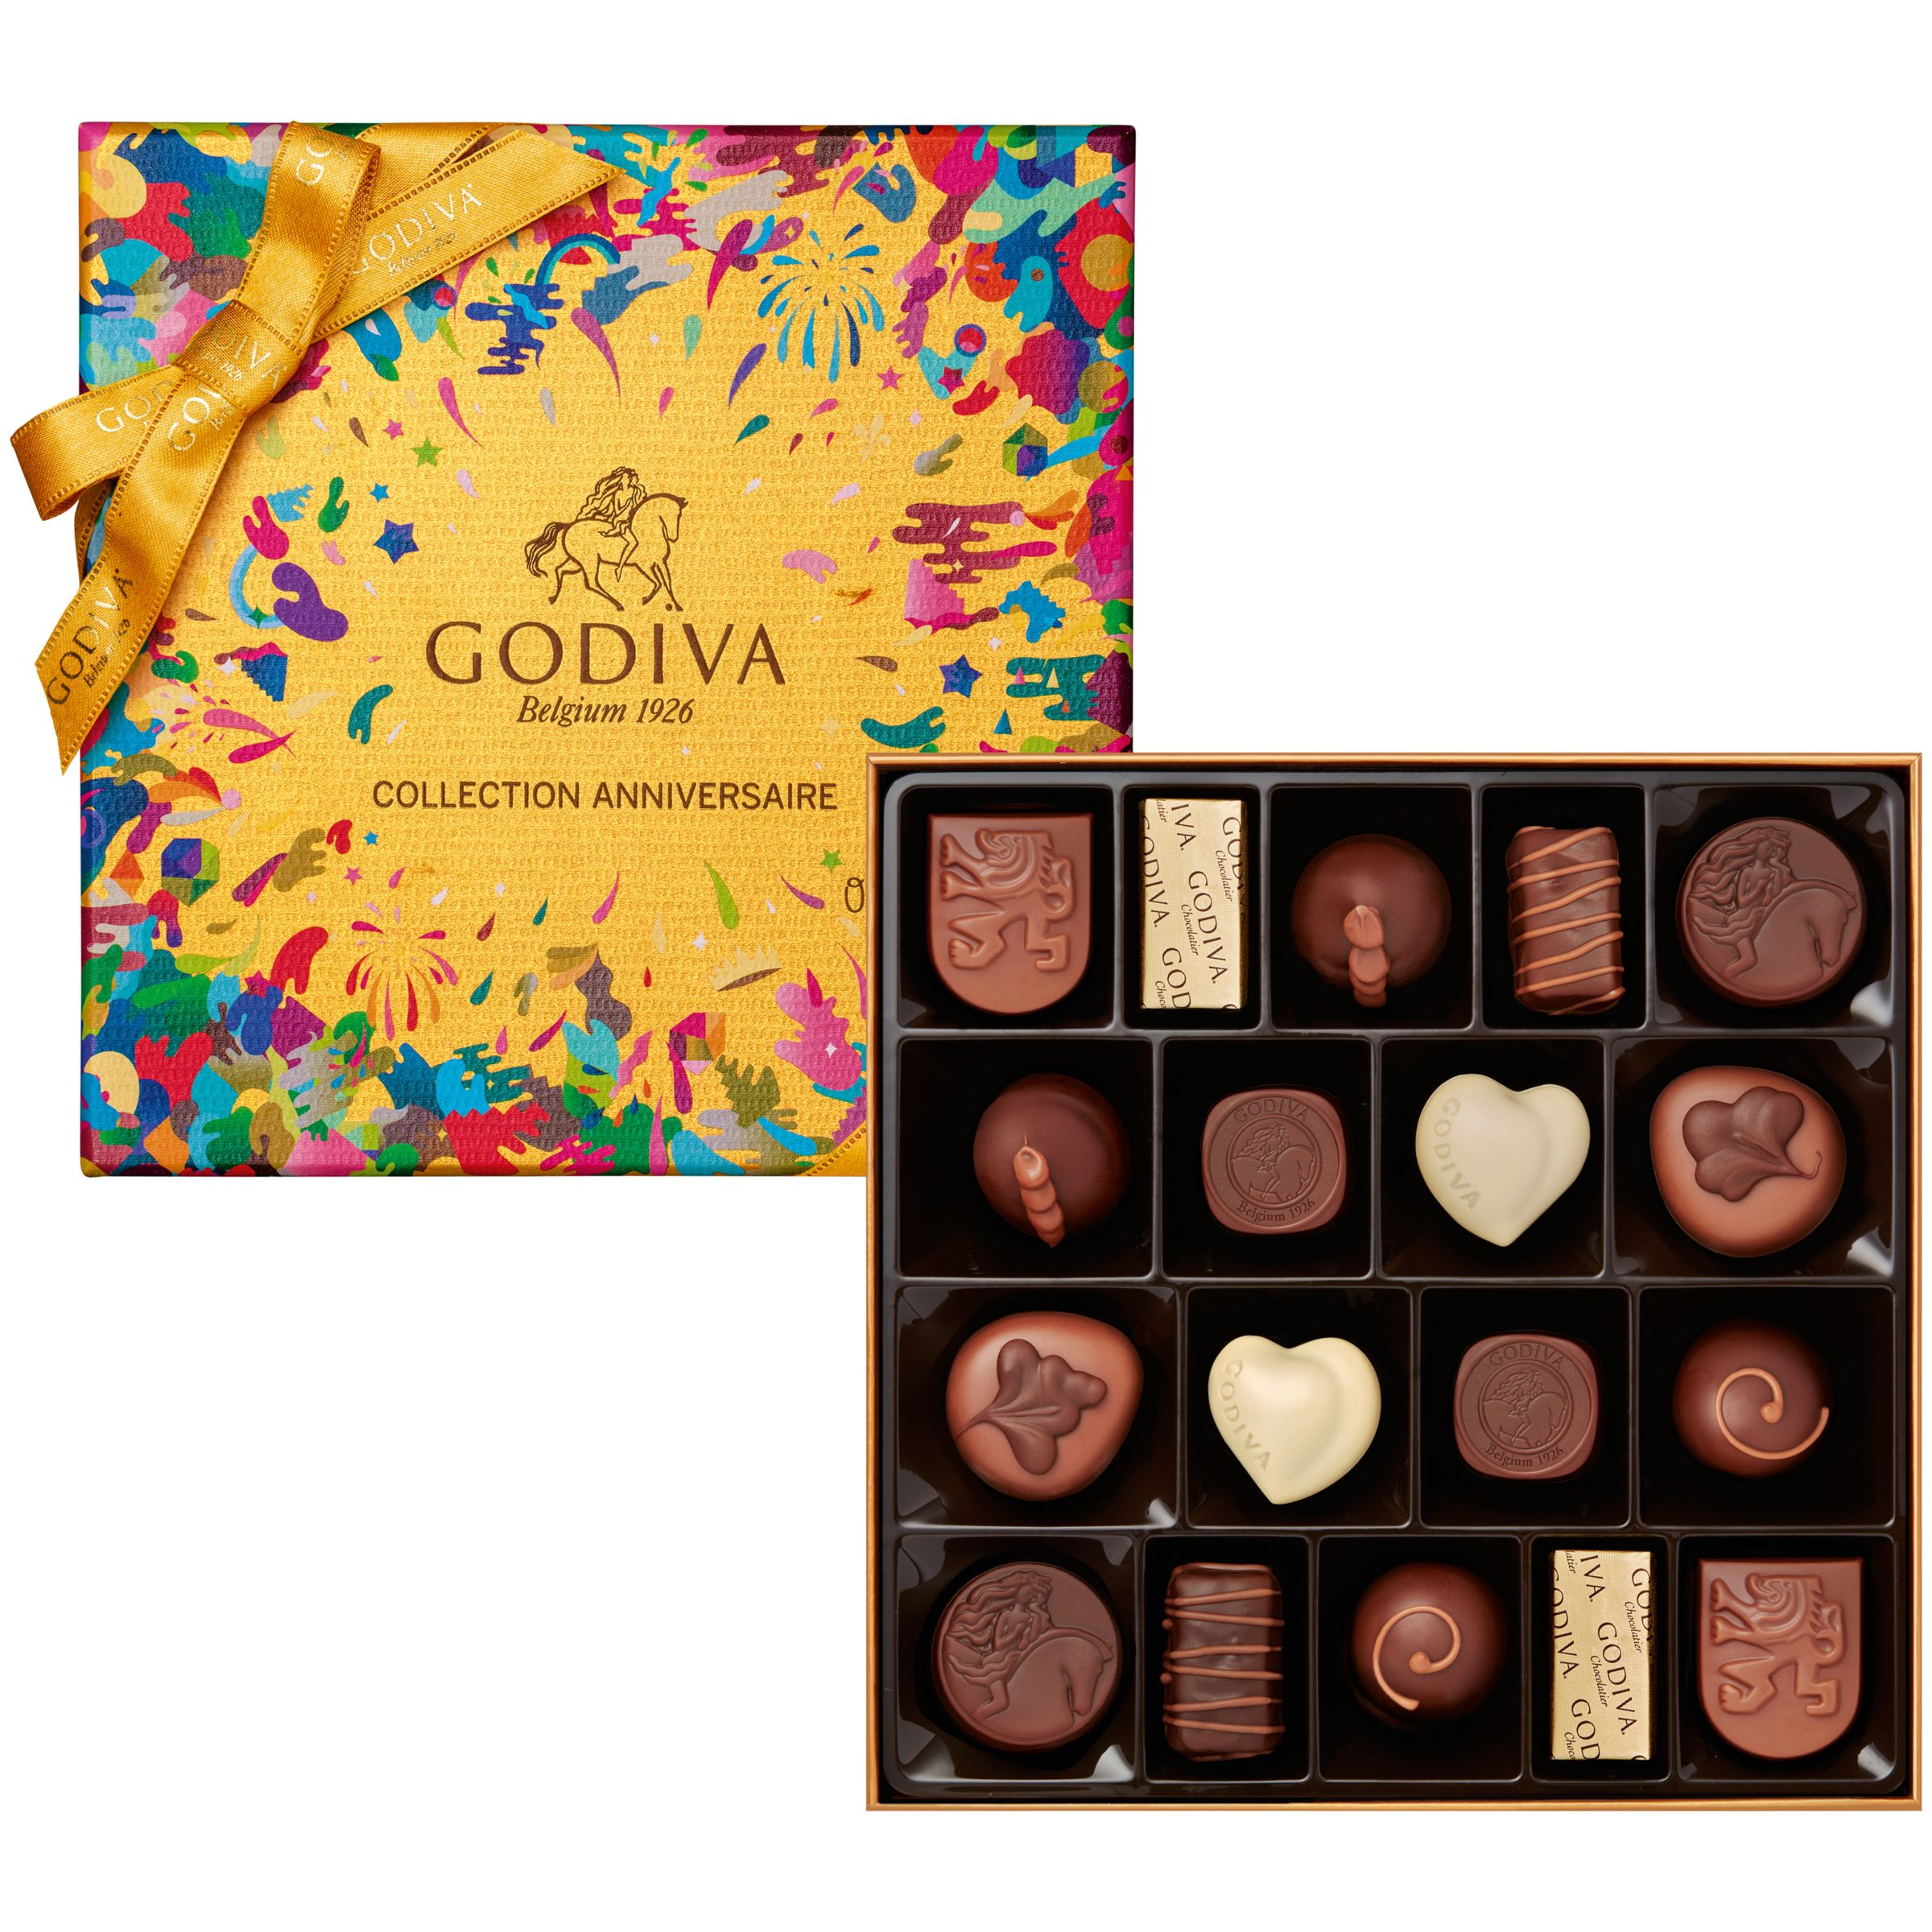 Godiva Godiva 'Collection Anniversaire' Box of Chocolates, 18 Pieces